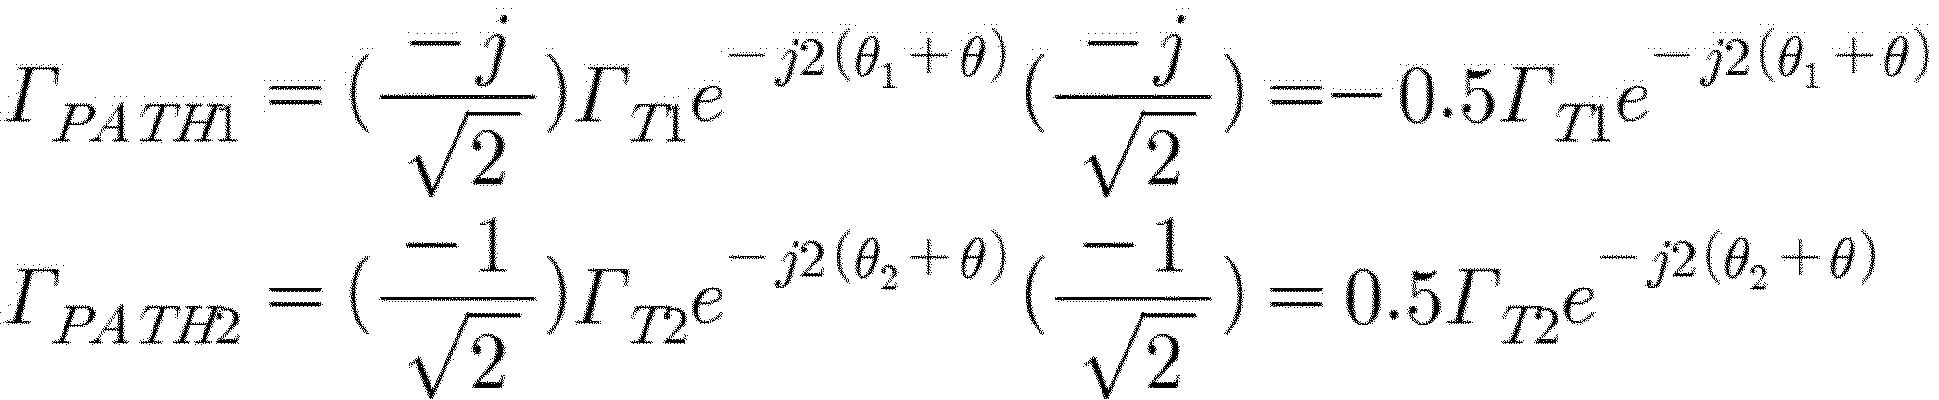 Figure PCTKR2016012769-appb-I000001